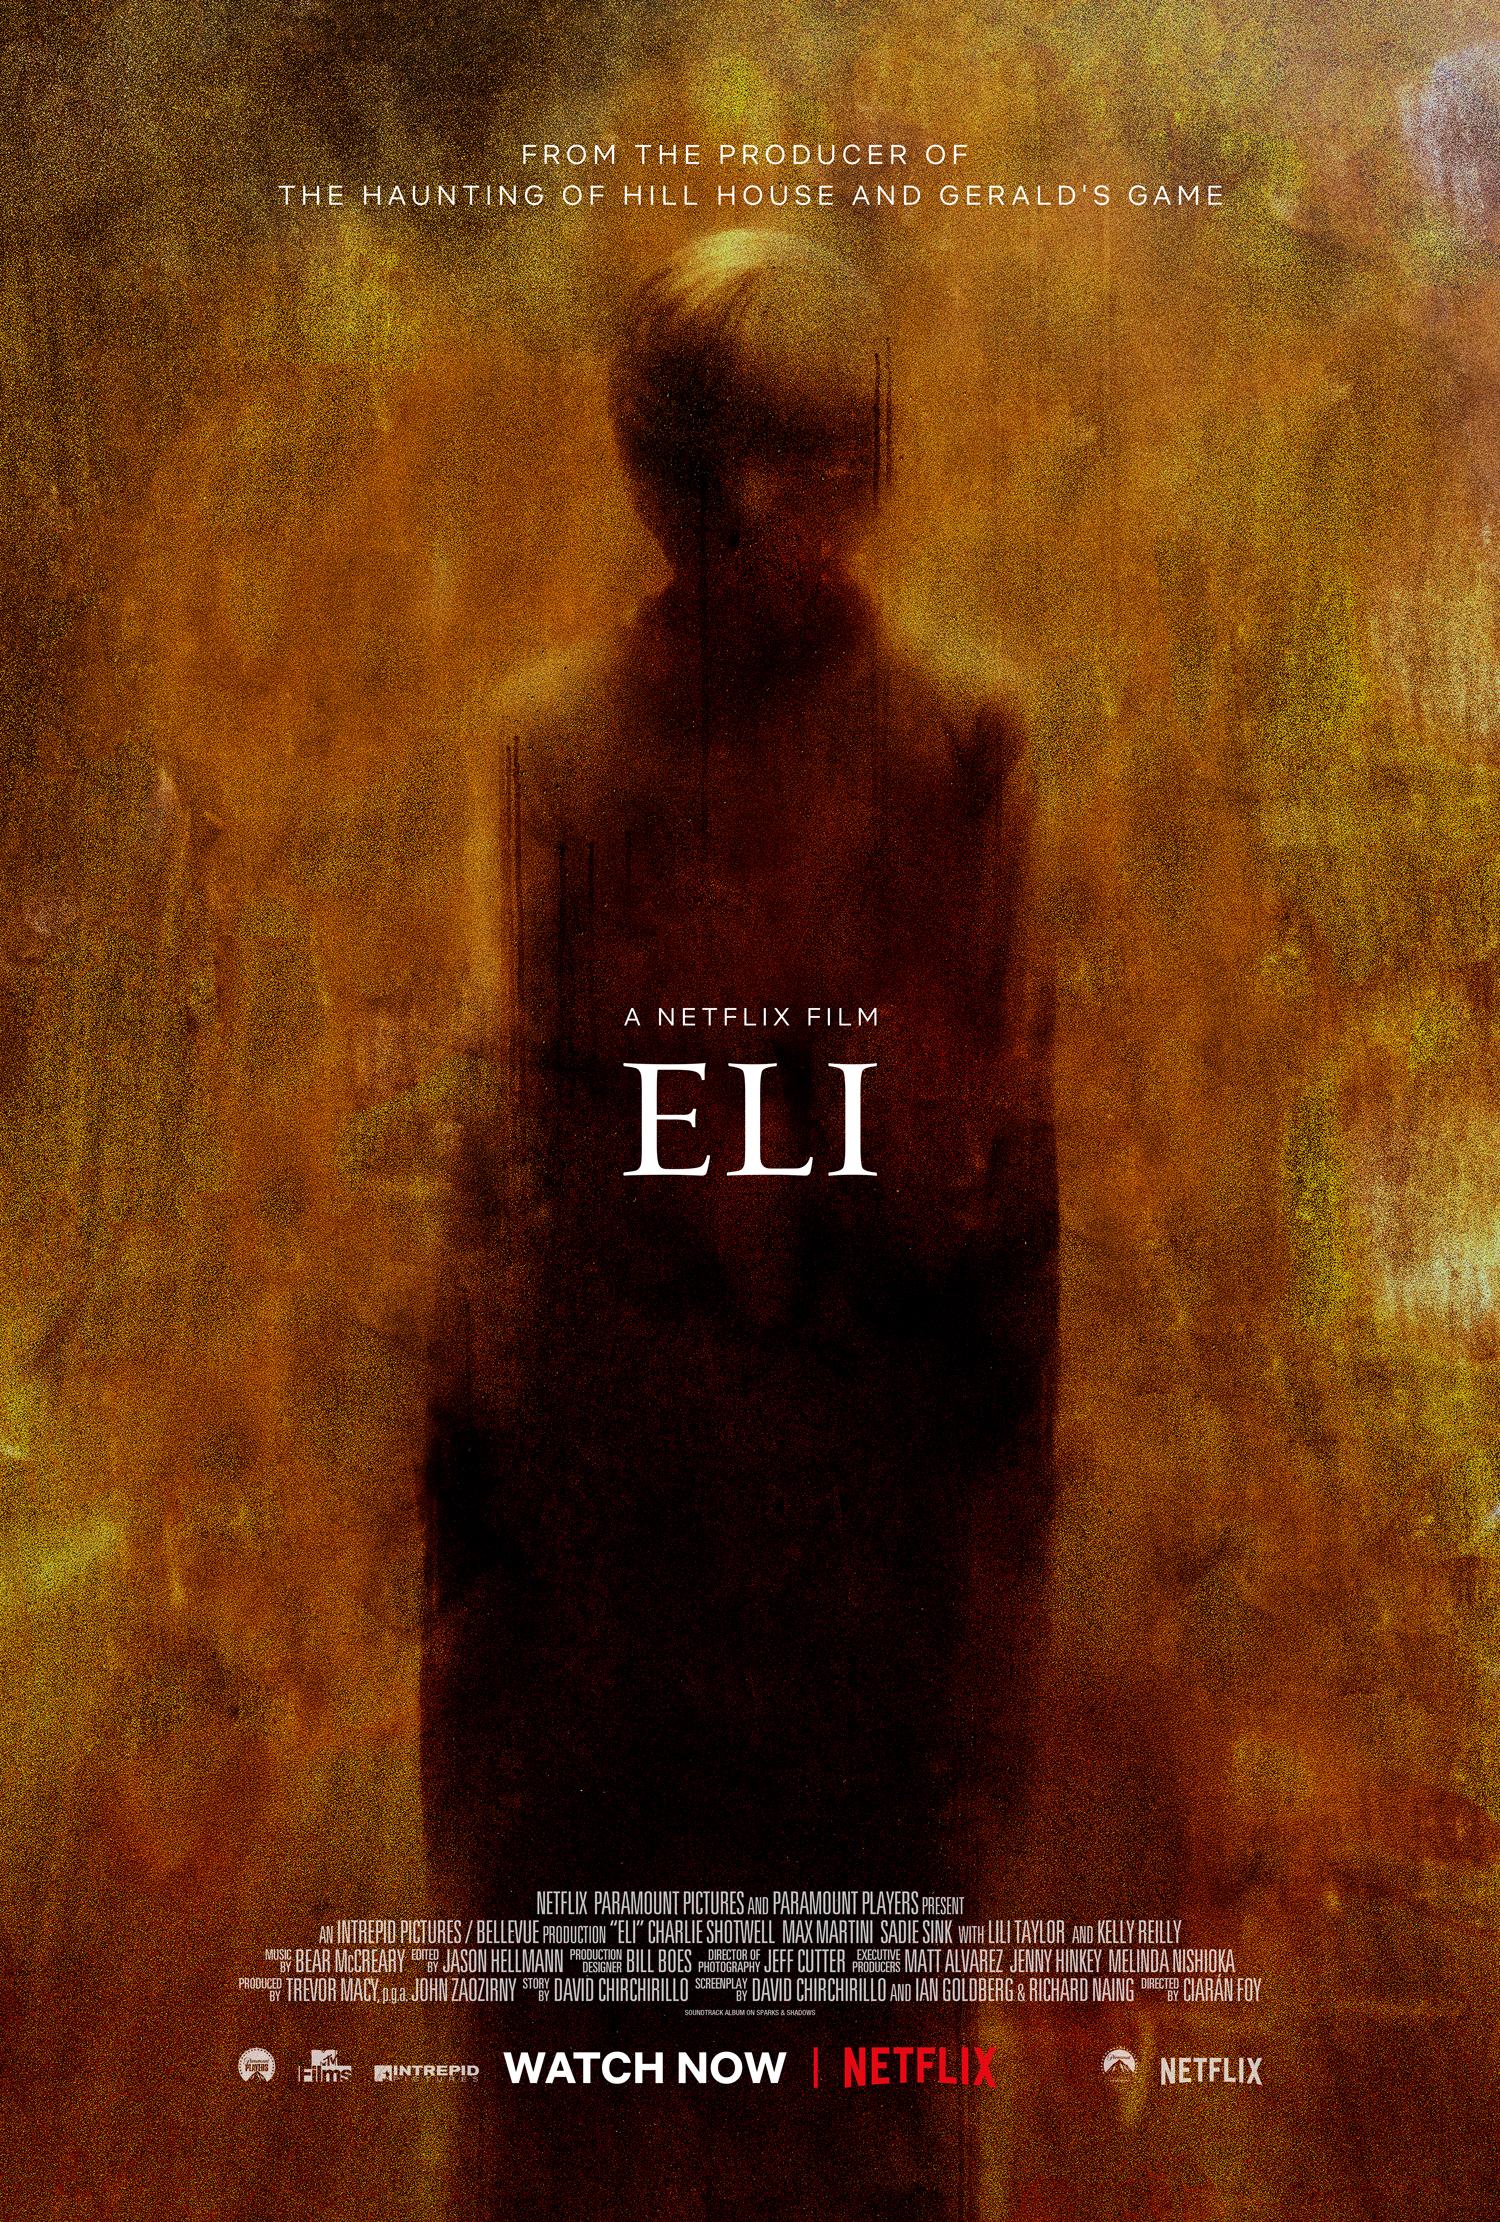 Eli 2019 Netflix movie poster